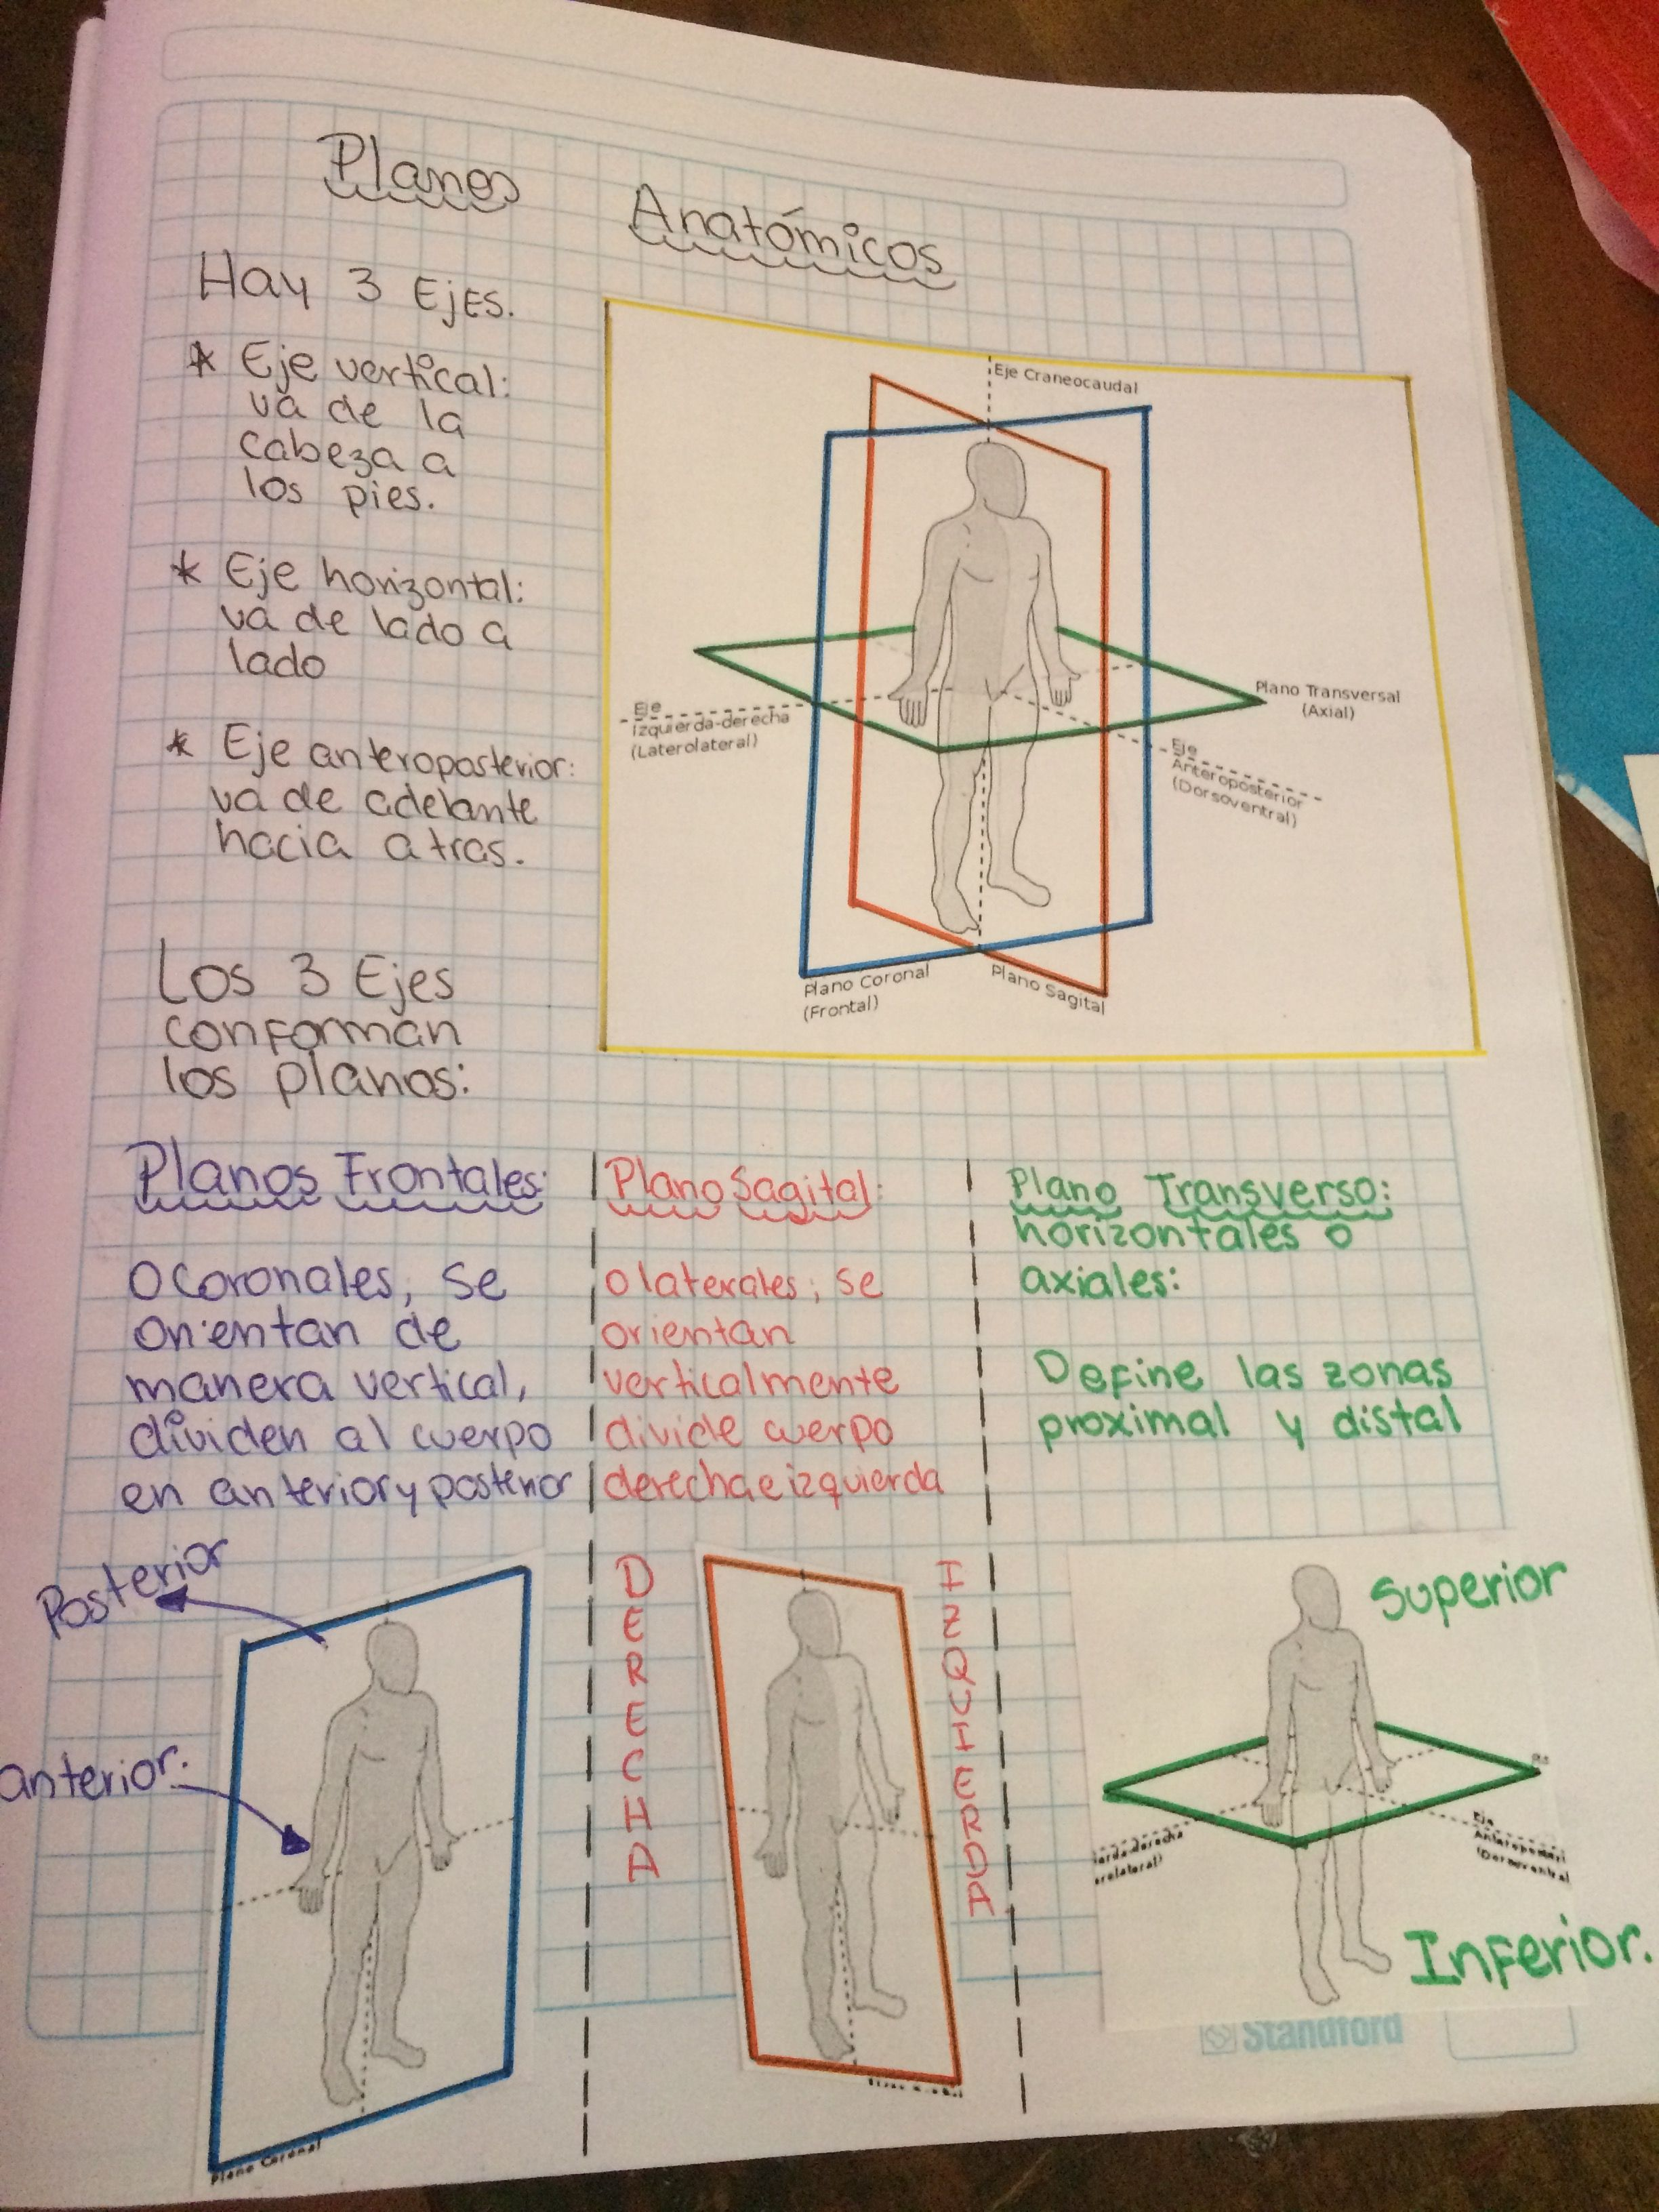 Planos anatomicos | Datos interesantes | Pinterest | Planos ...